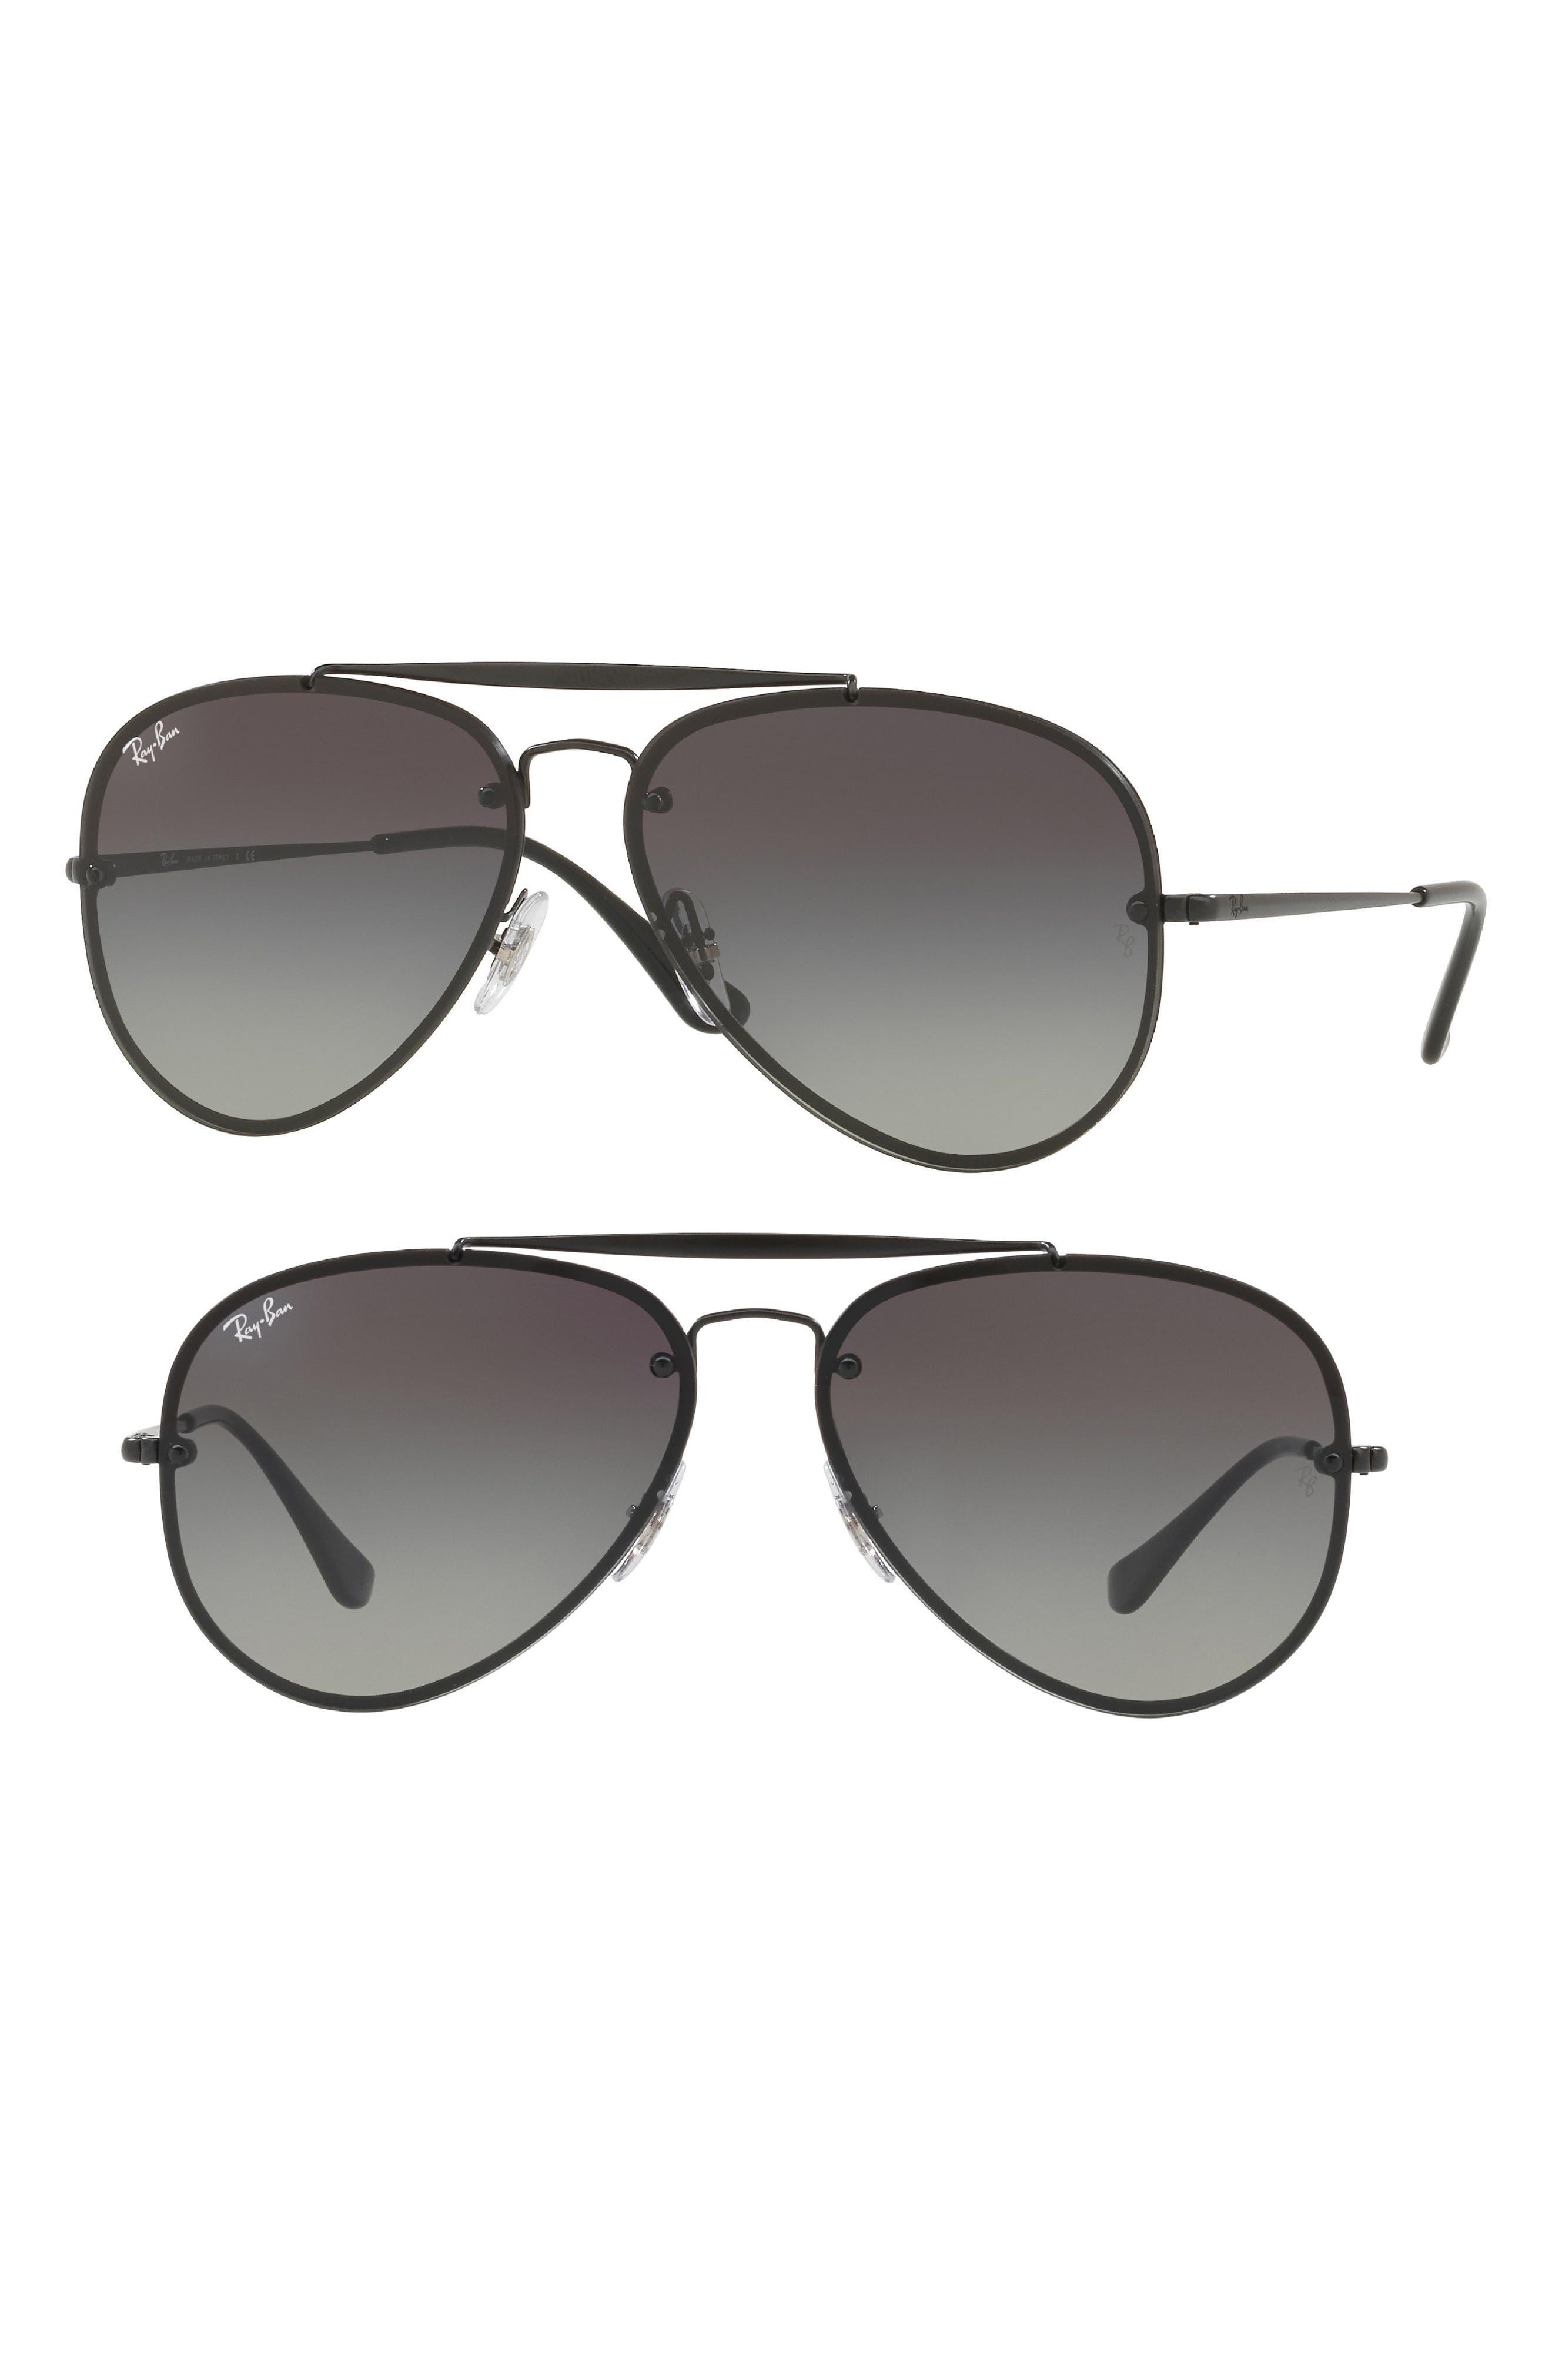 58mm Aviator Sunglasses,                             Main thumbnail 1, color,                             Shiny Black